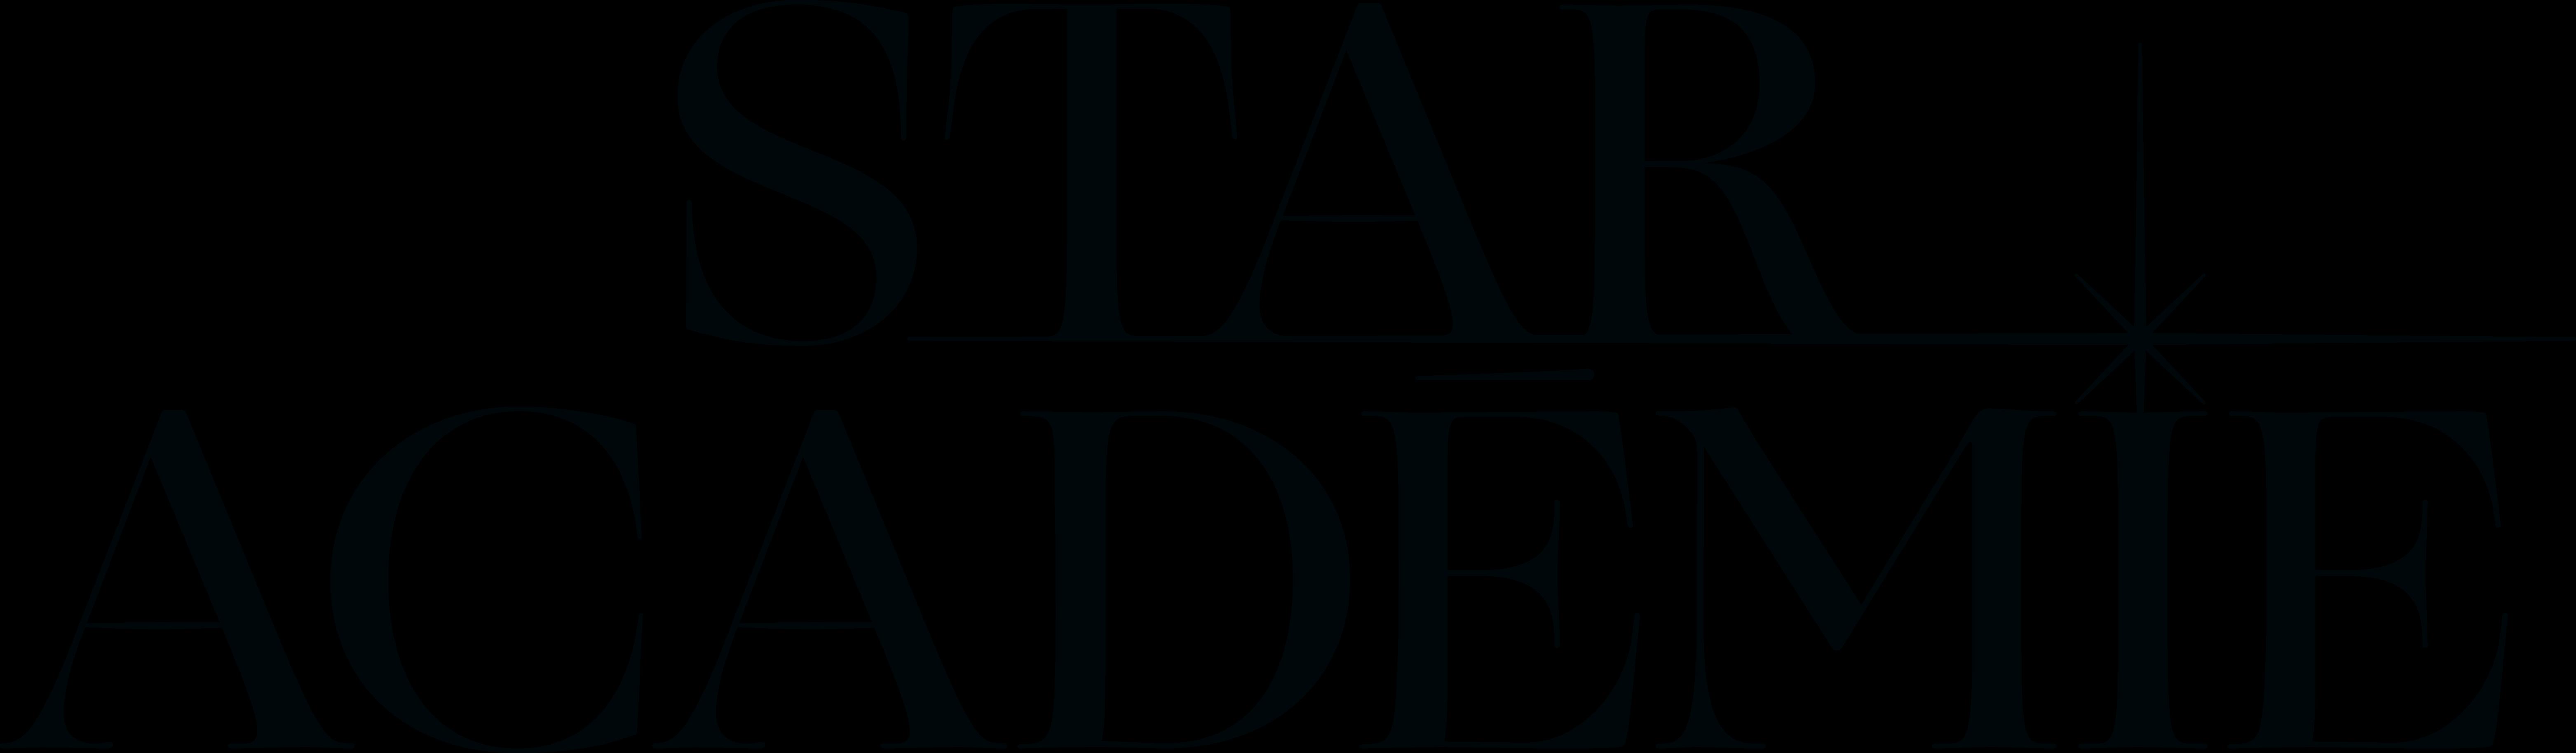 1625002192500-StarAc_Logo_Grand_Noir_1500px.png